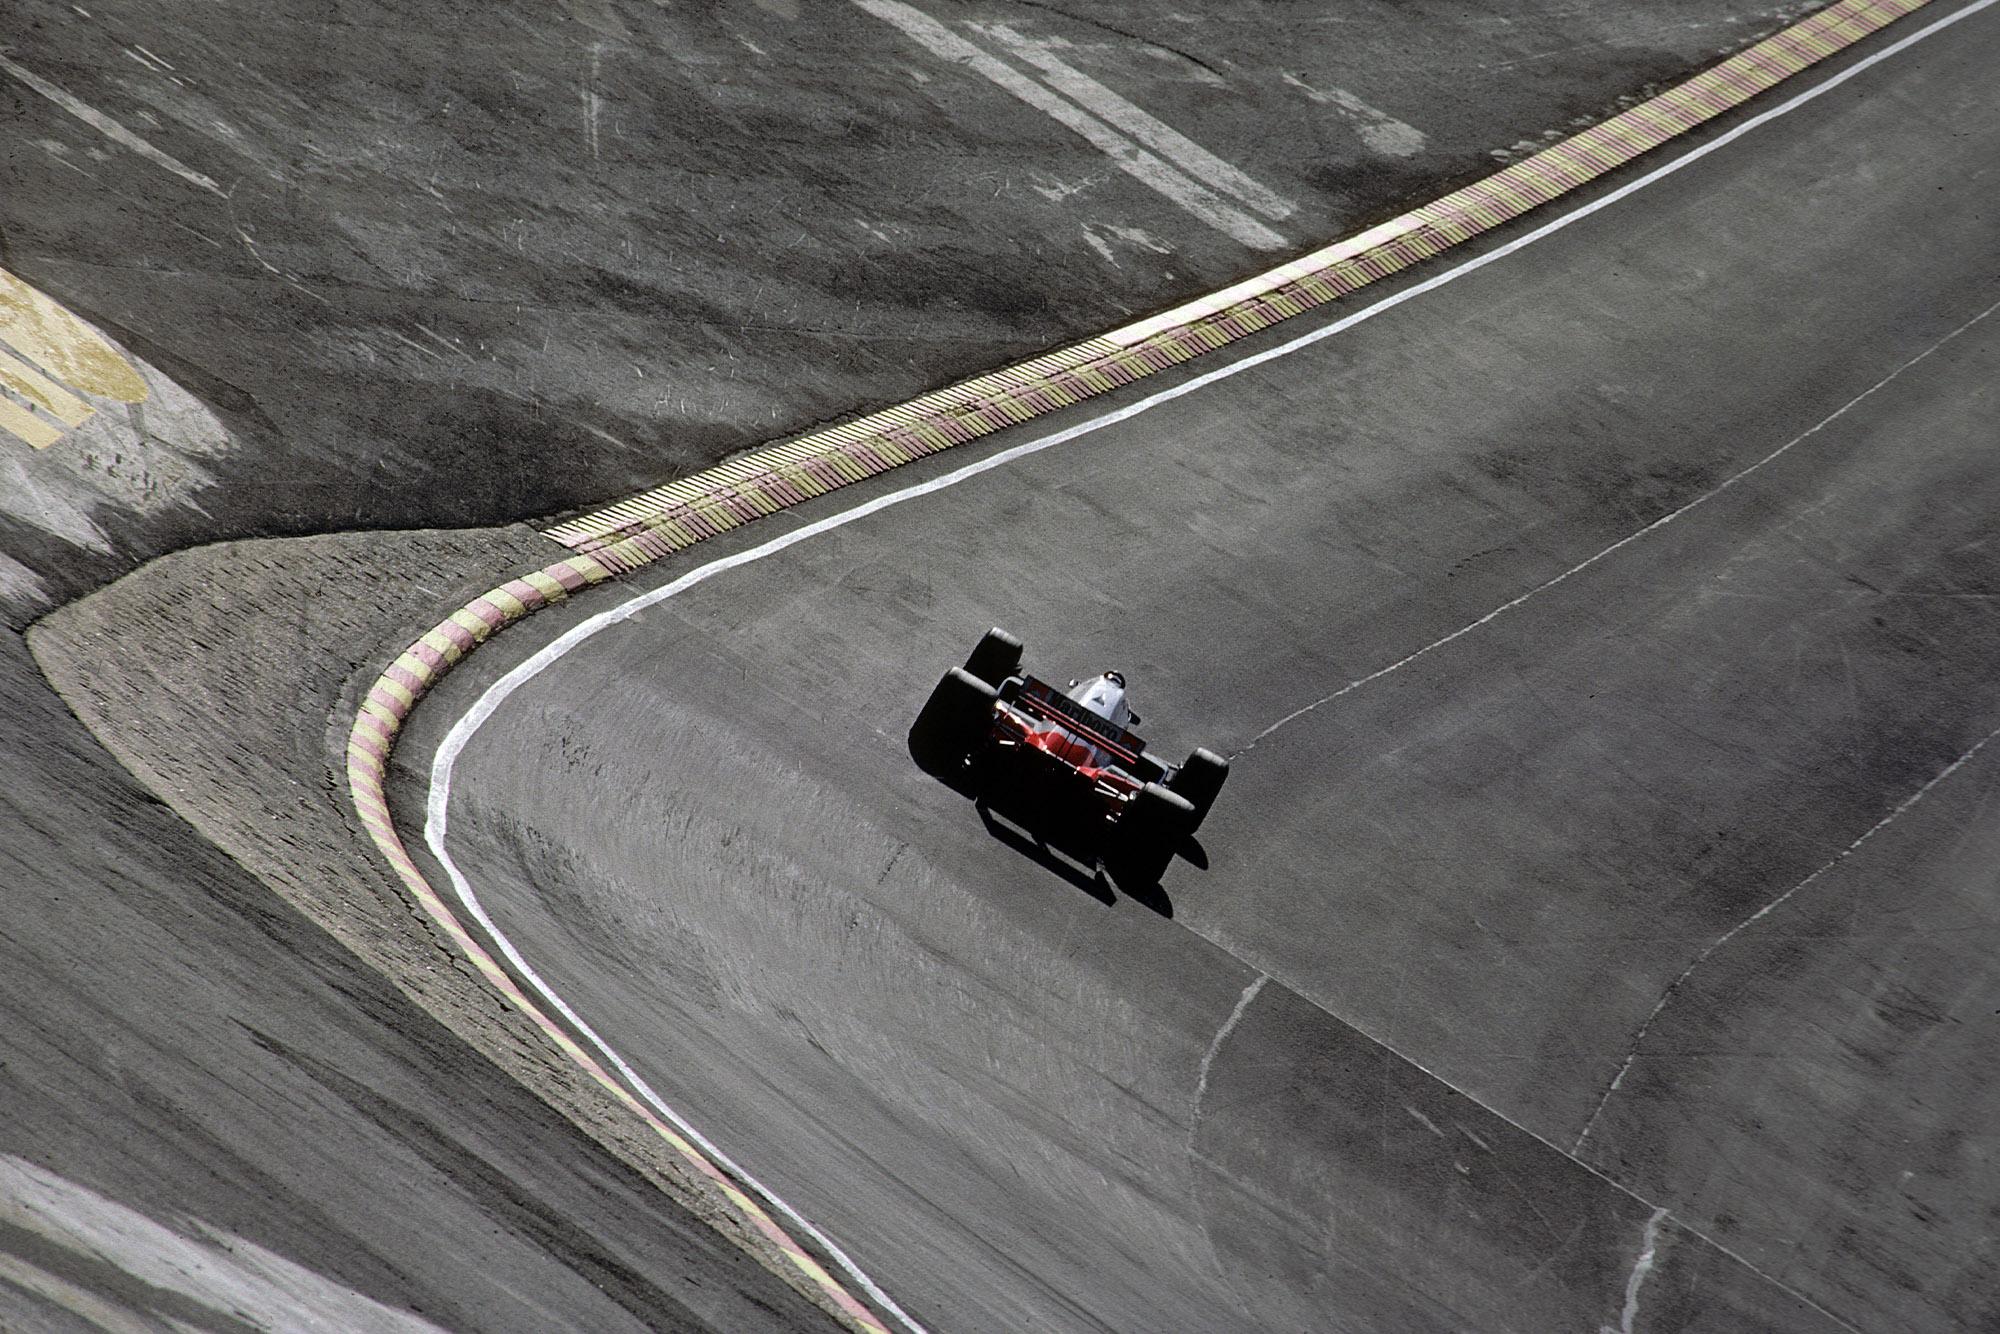 Alain Prost at Brands Hatch